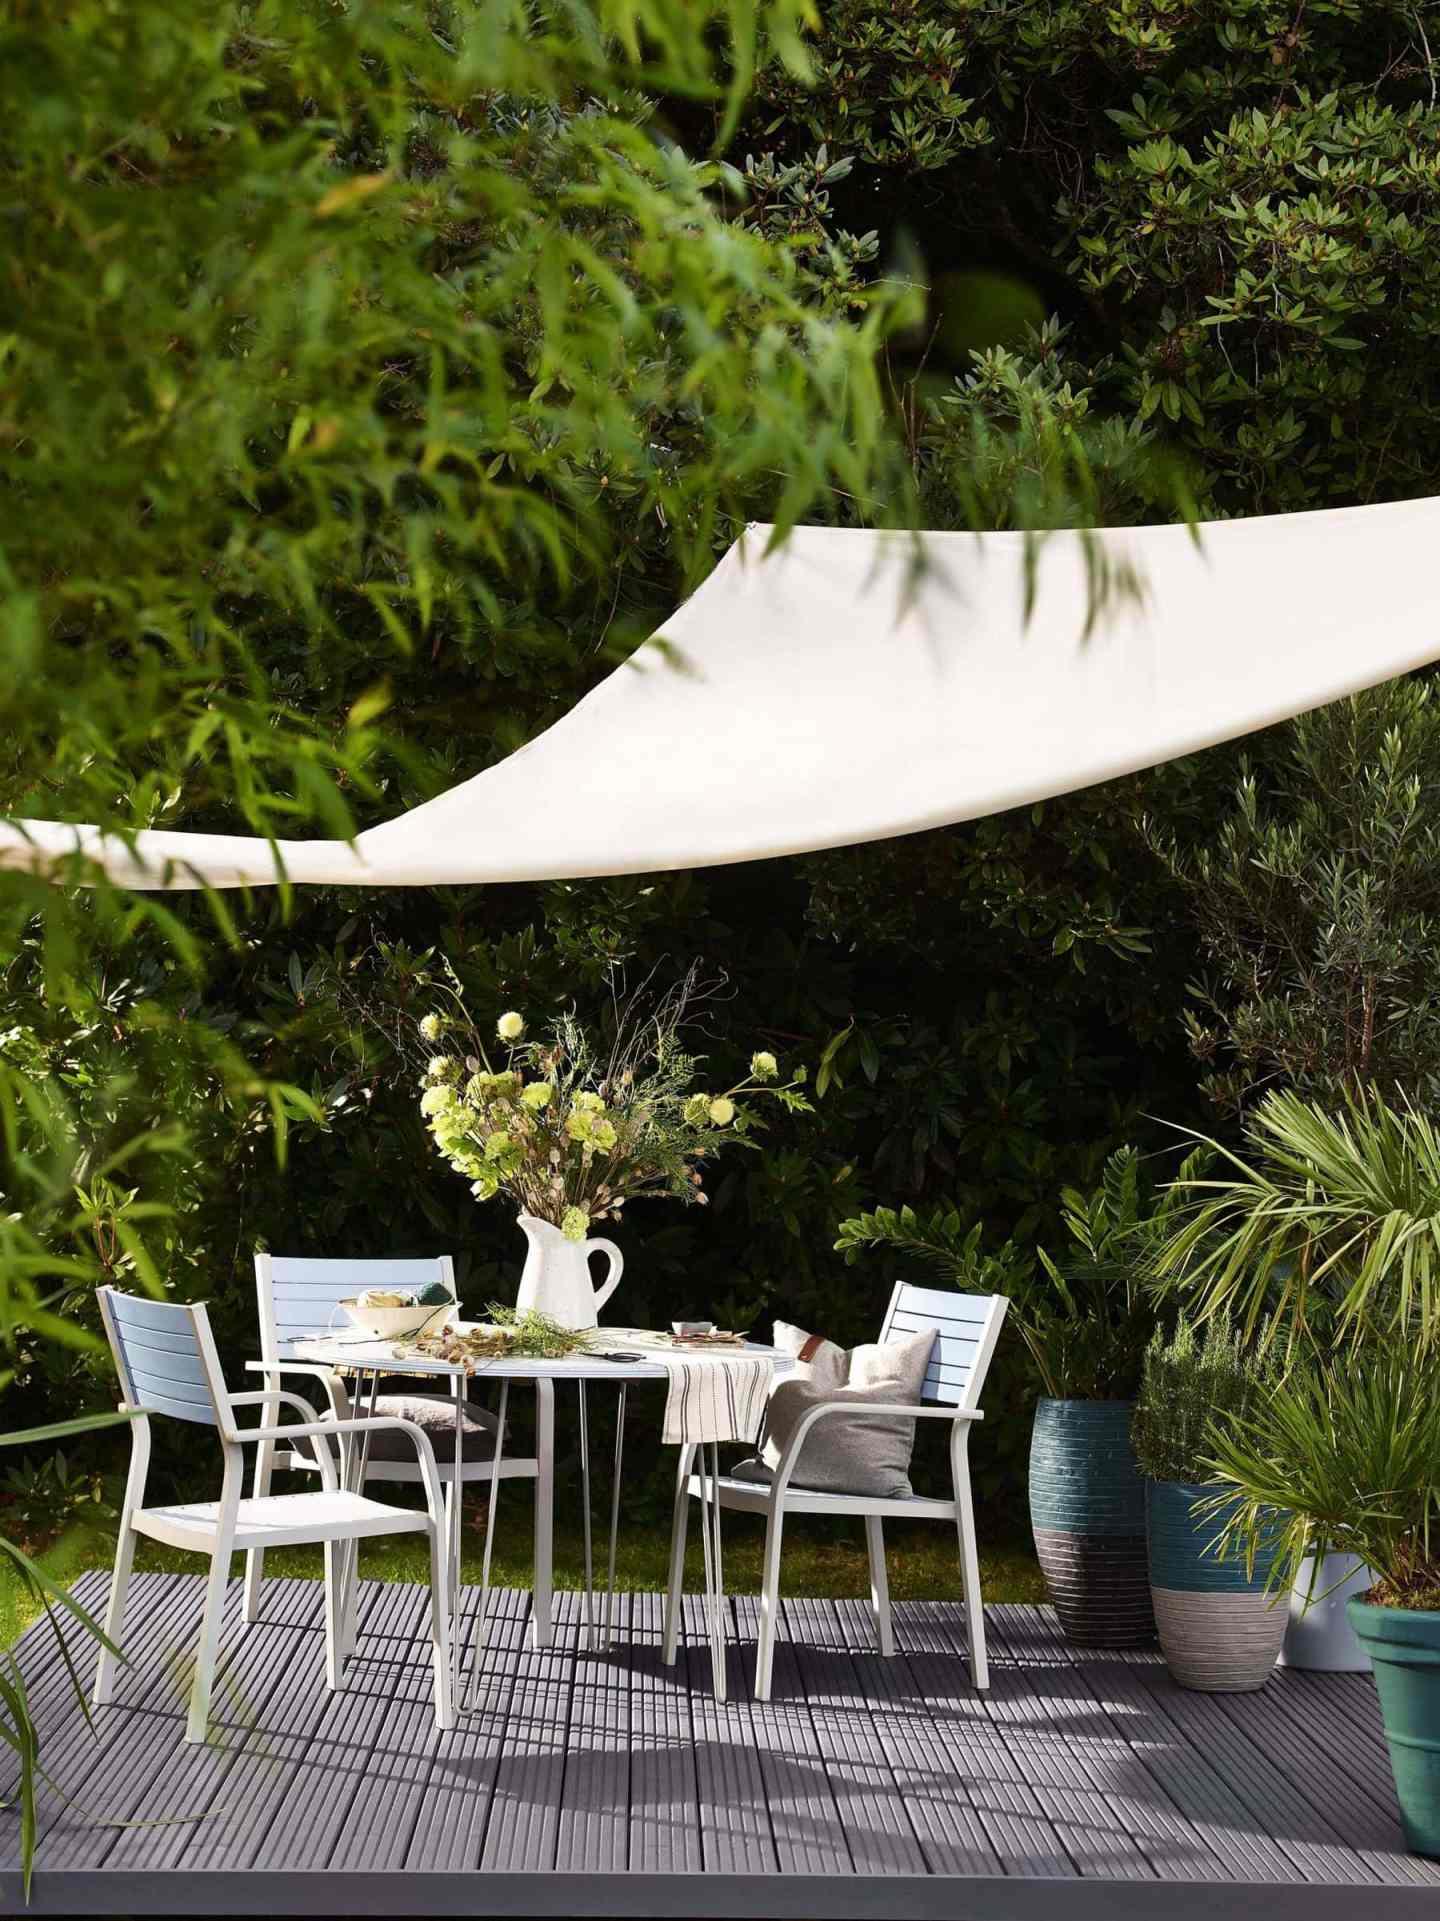 garden, gardening, budget garden, garden ideas, lawn, grass, budget decor, diy, garden details, plants